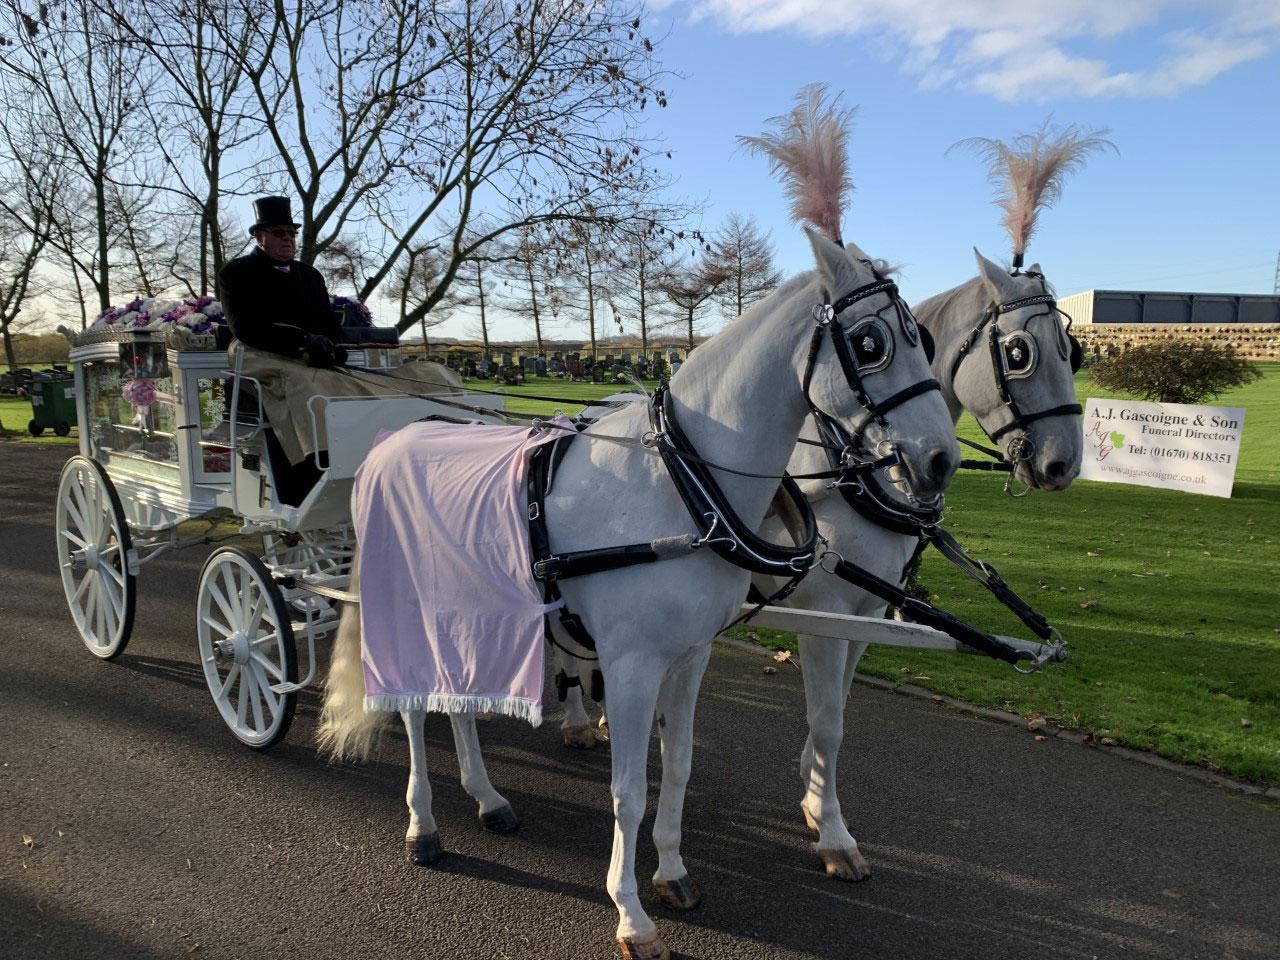 Horse Drawn Carriage at A.J. Gascoigne and Son